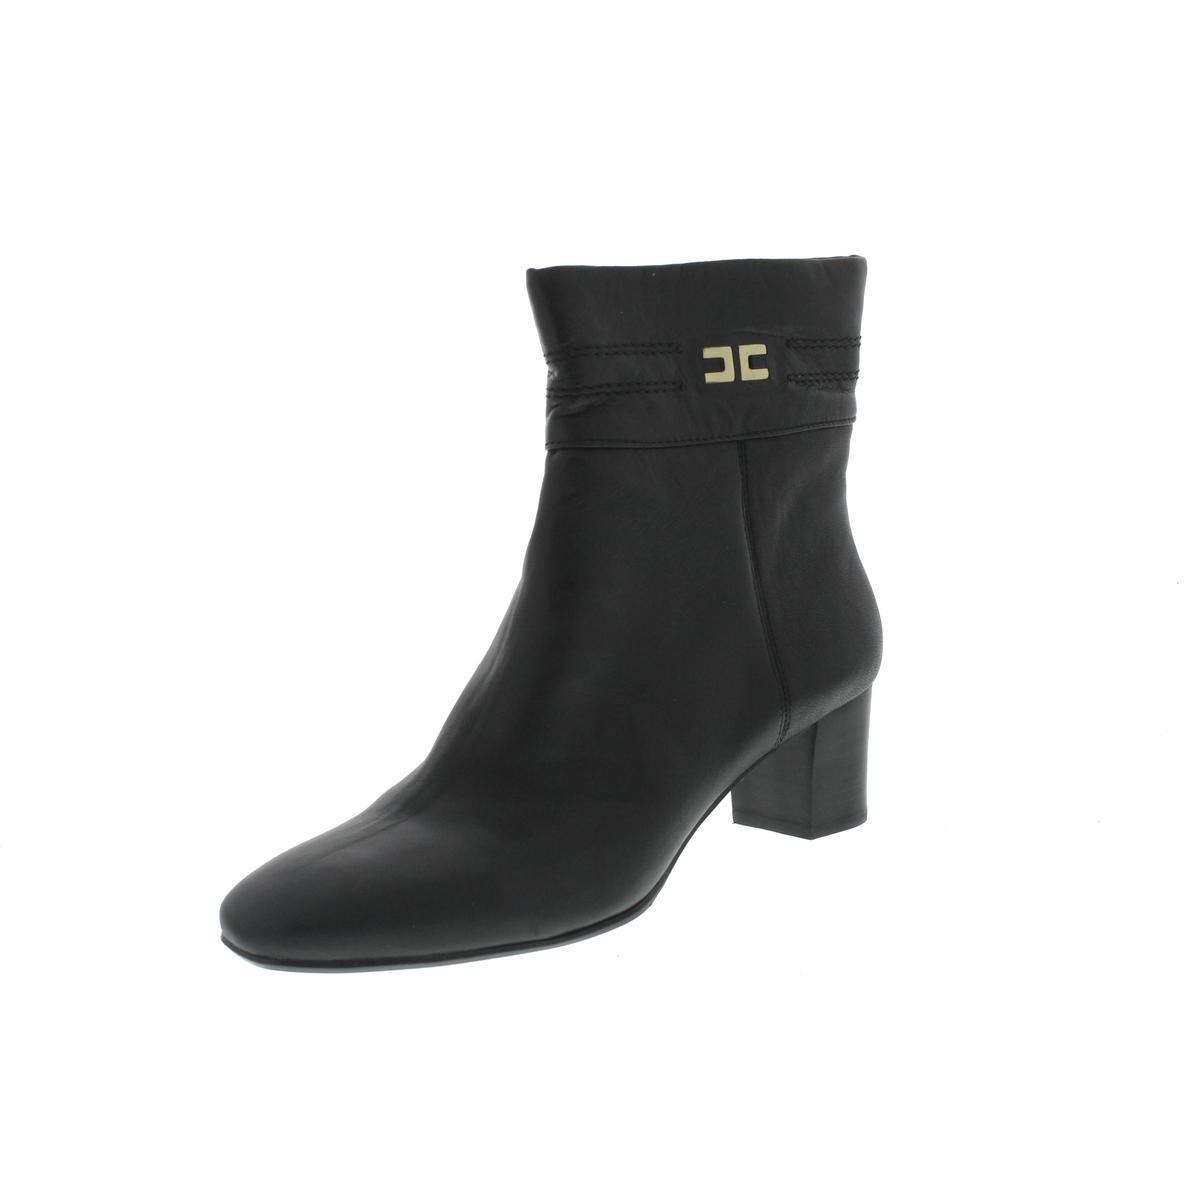 2ba5c6ab15 Details about Bandolino Womens Dajuda Black Shoes Ankle Boots Heels 7.5  Medium (B,M) BHFO 5253